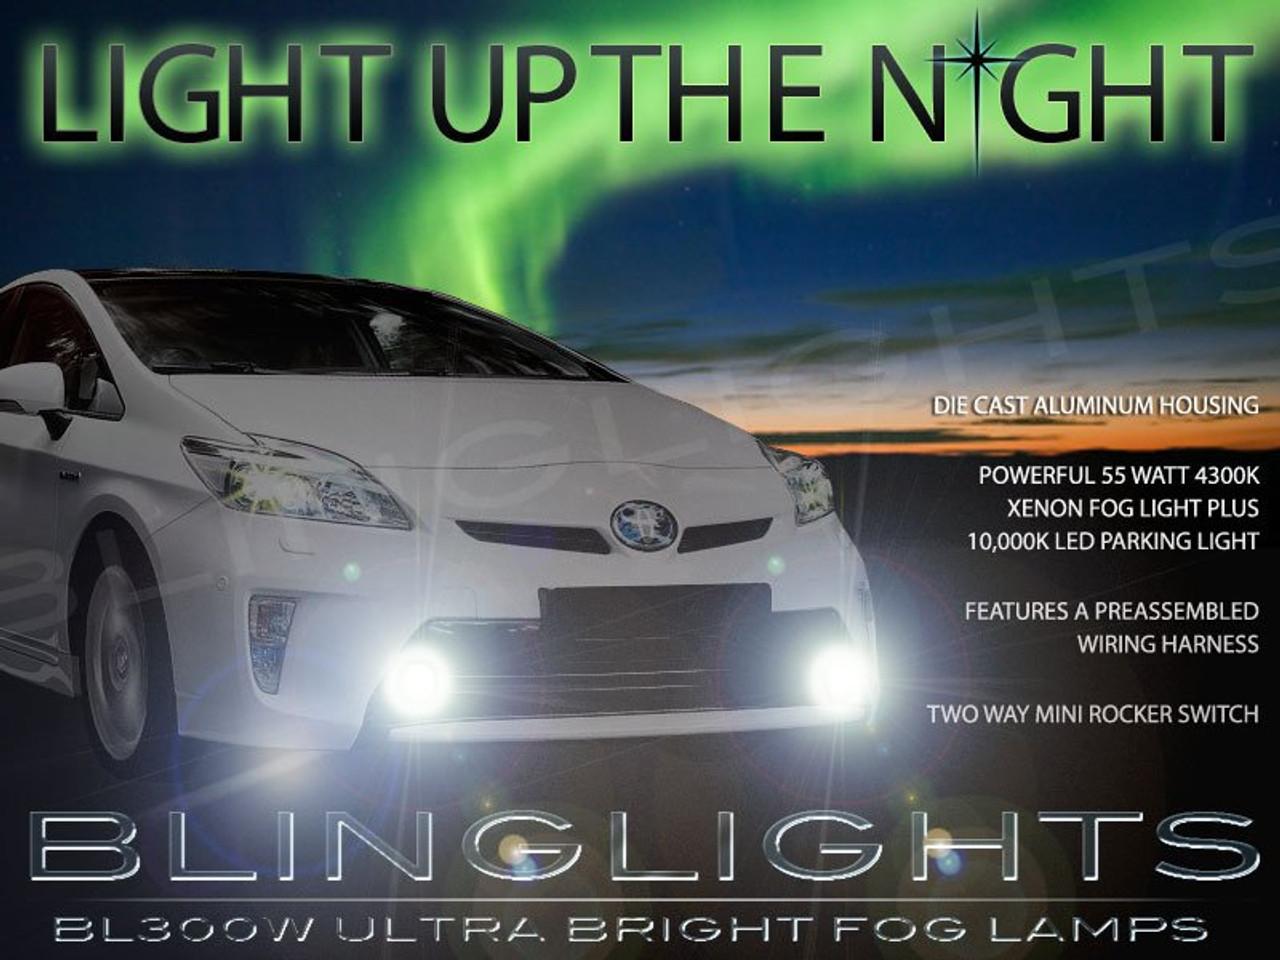 2012 2013 2014 Toyota Prius Fog Lamps Driving Light Kit Xenon